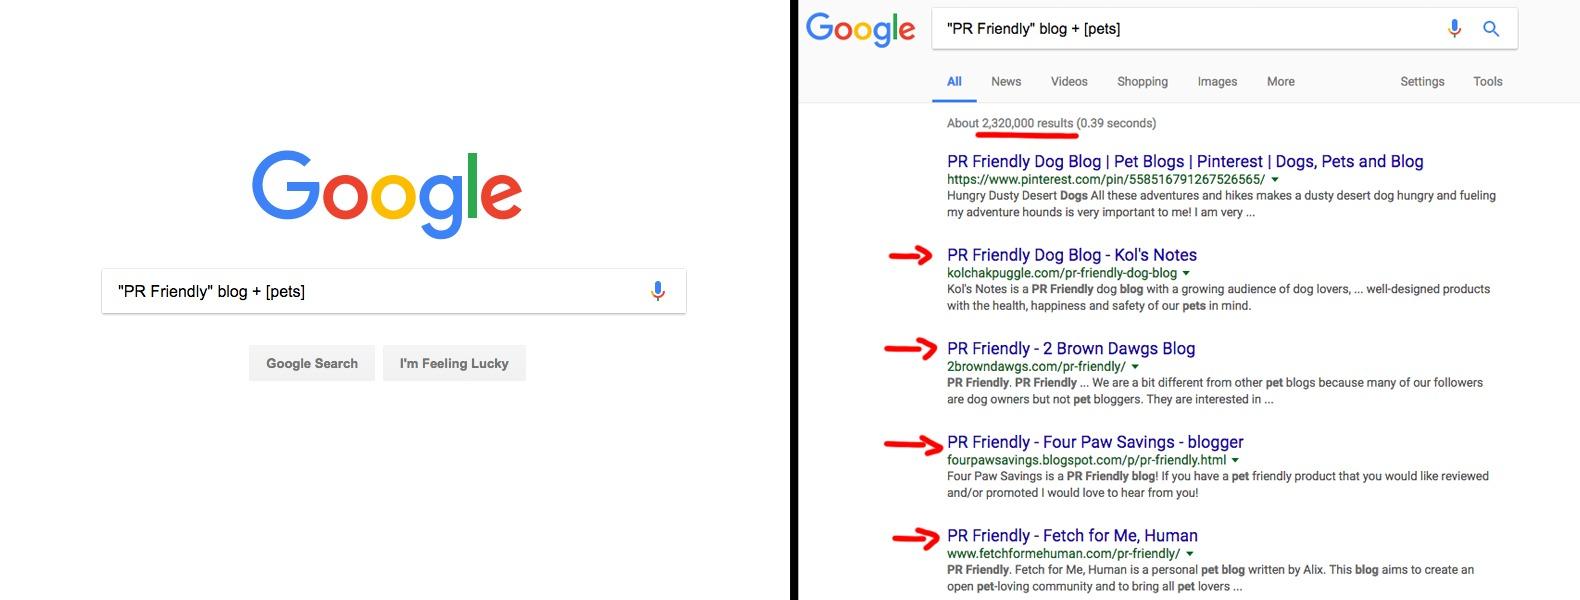 Google Blogging Opportunities